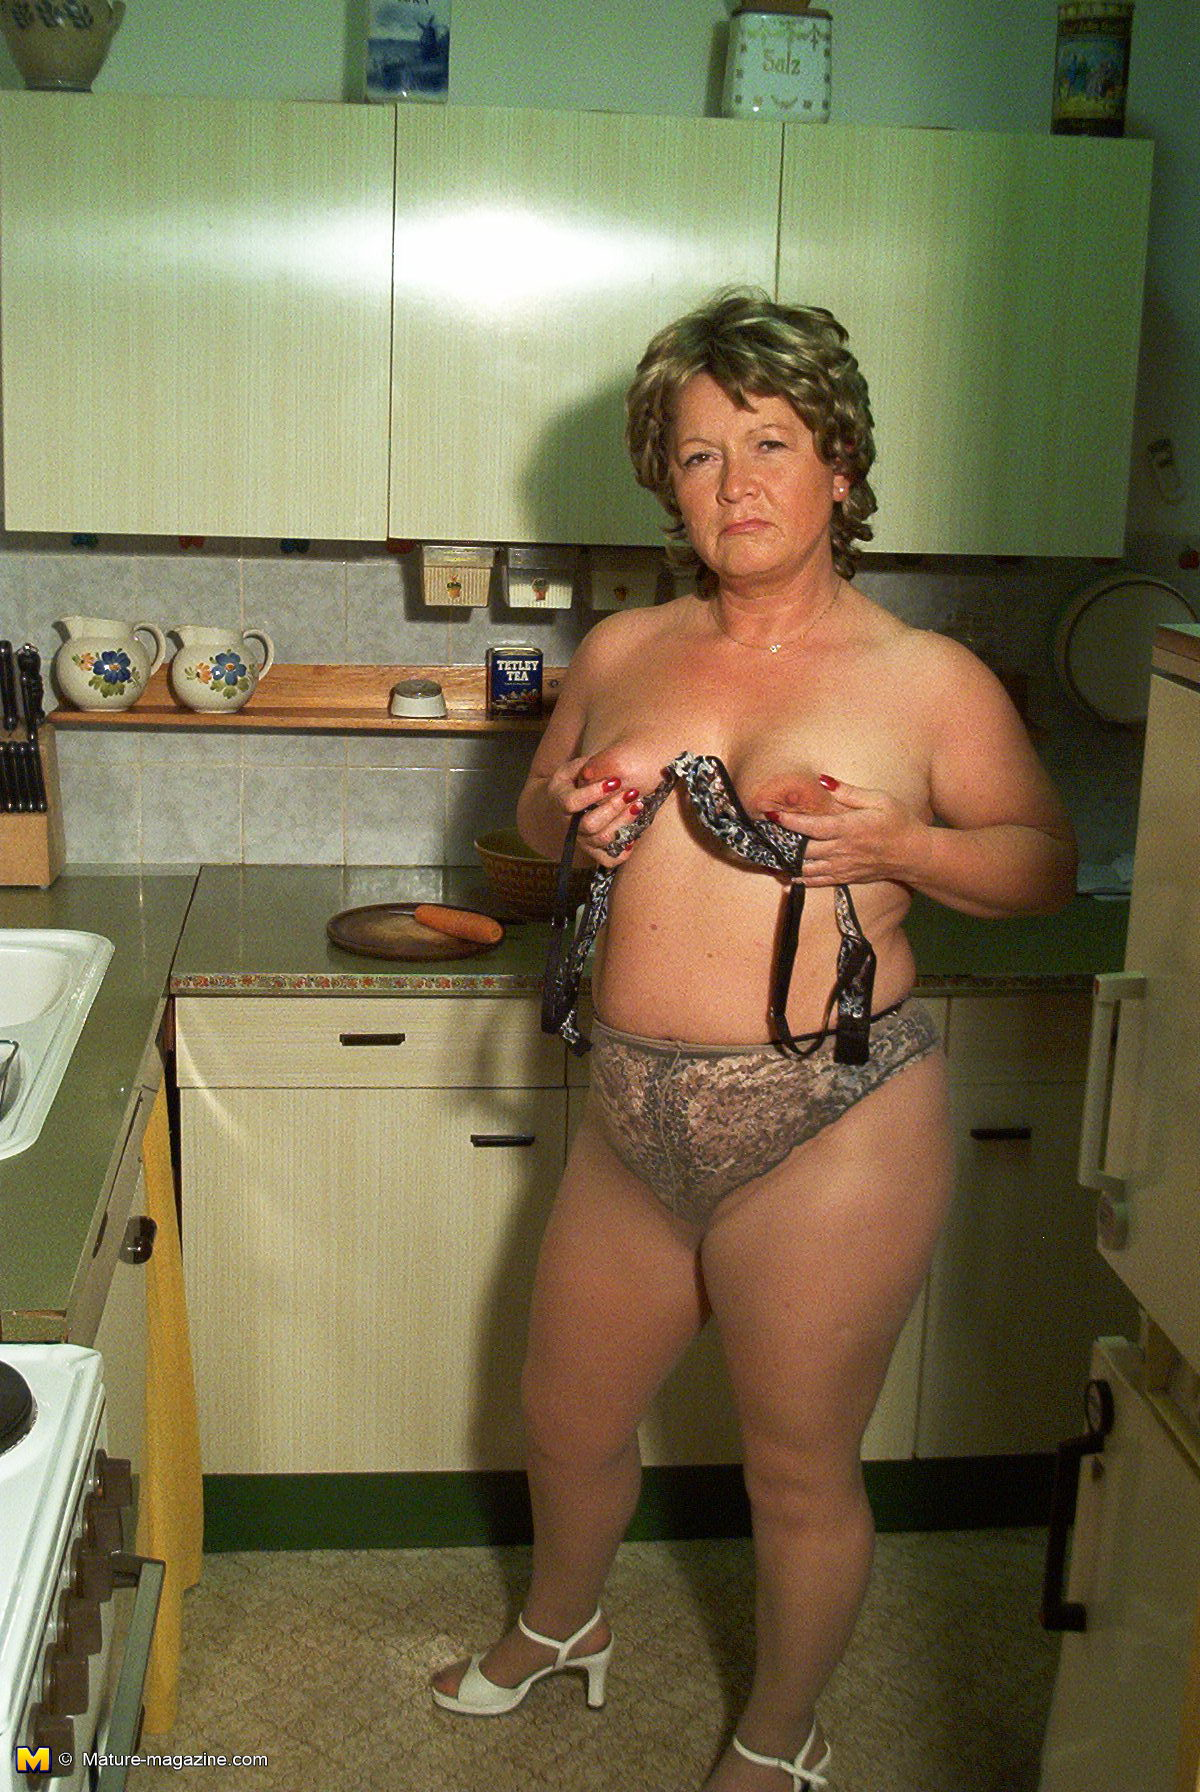 Long dress strap on dildo